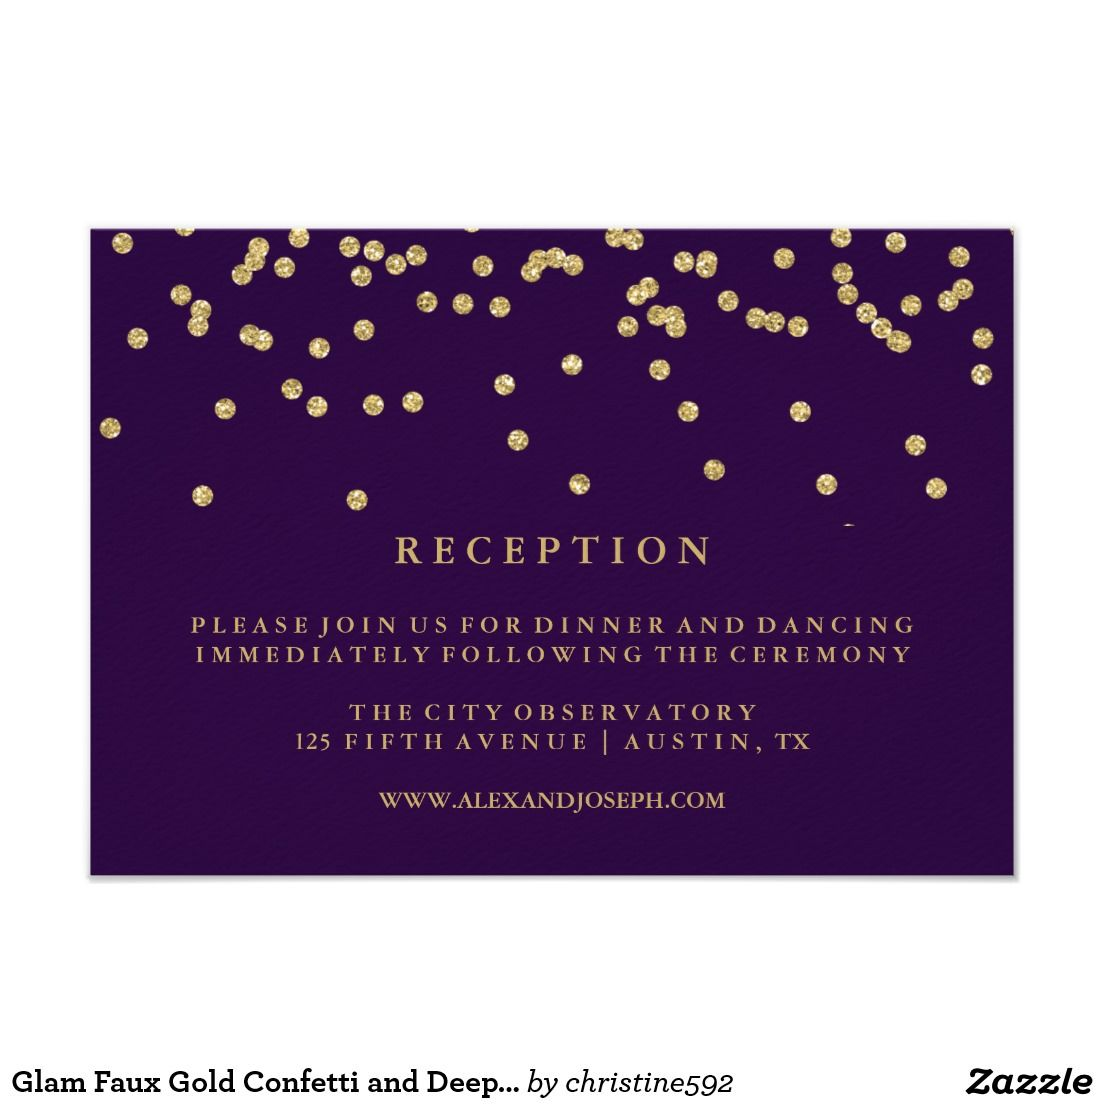 Glam faux gold confetti and deep purple reception card wedding